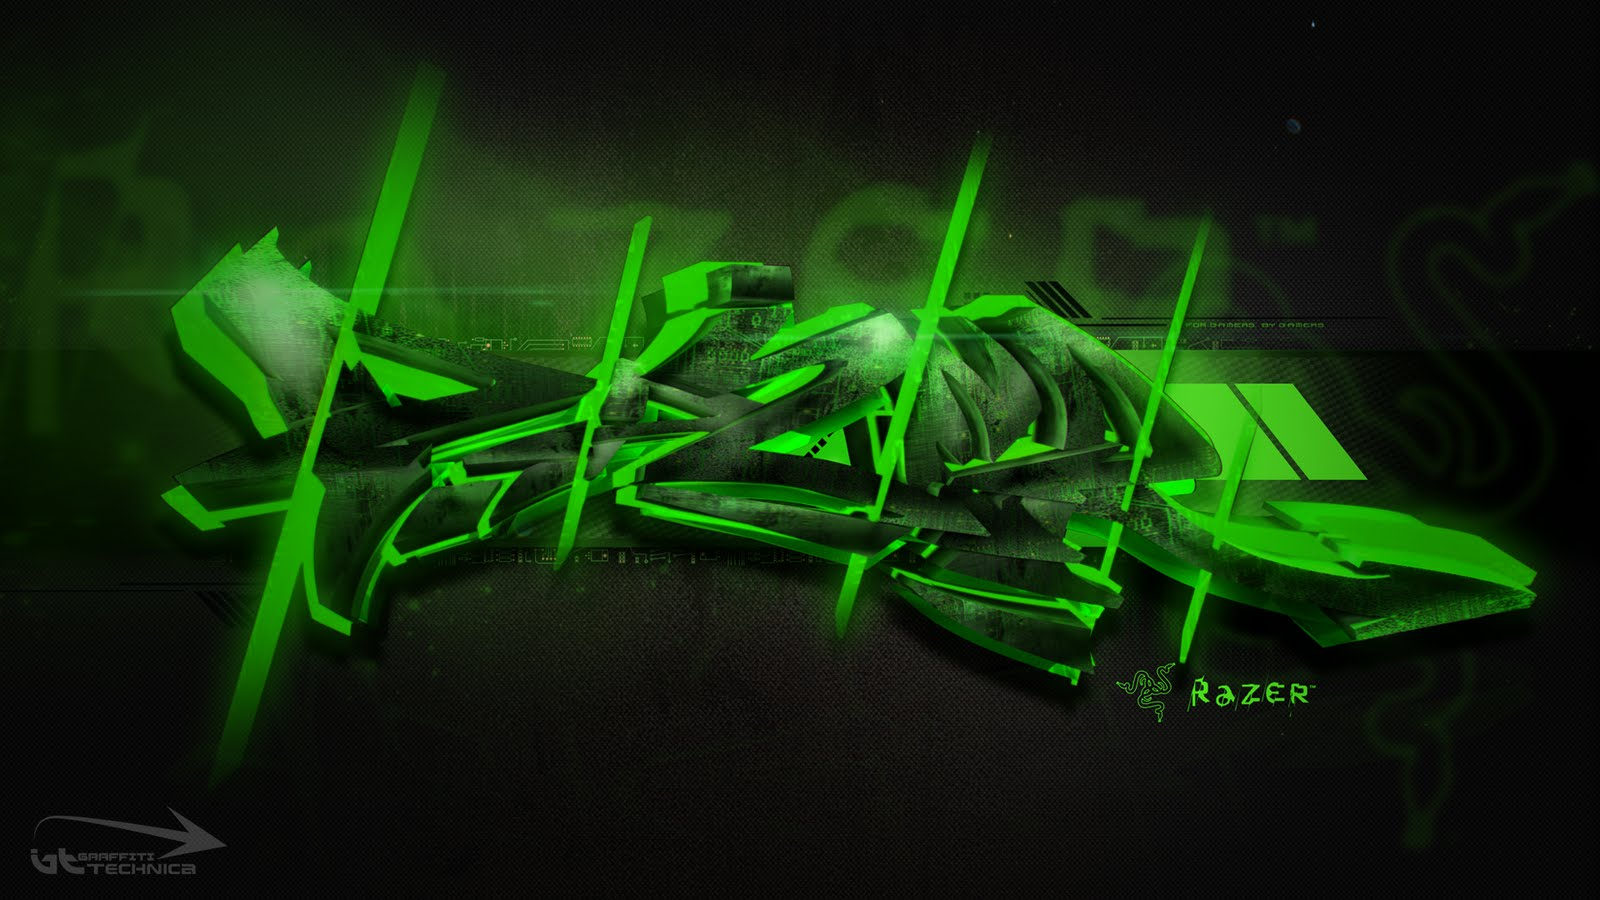 Asus Green Wallpaper: Razer Wallpaper HD